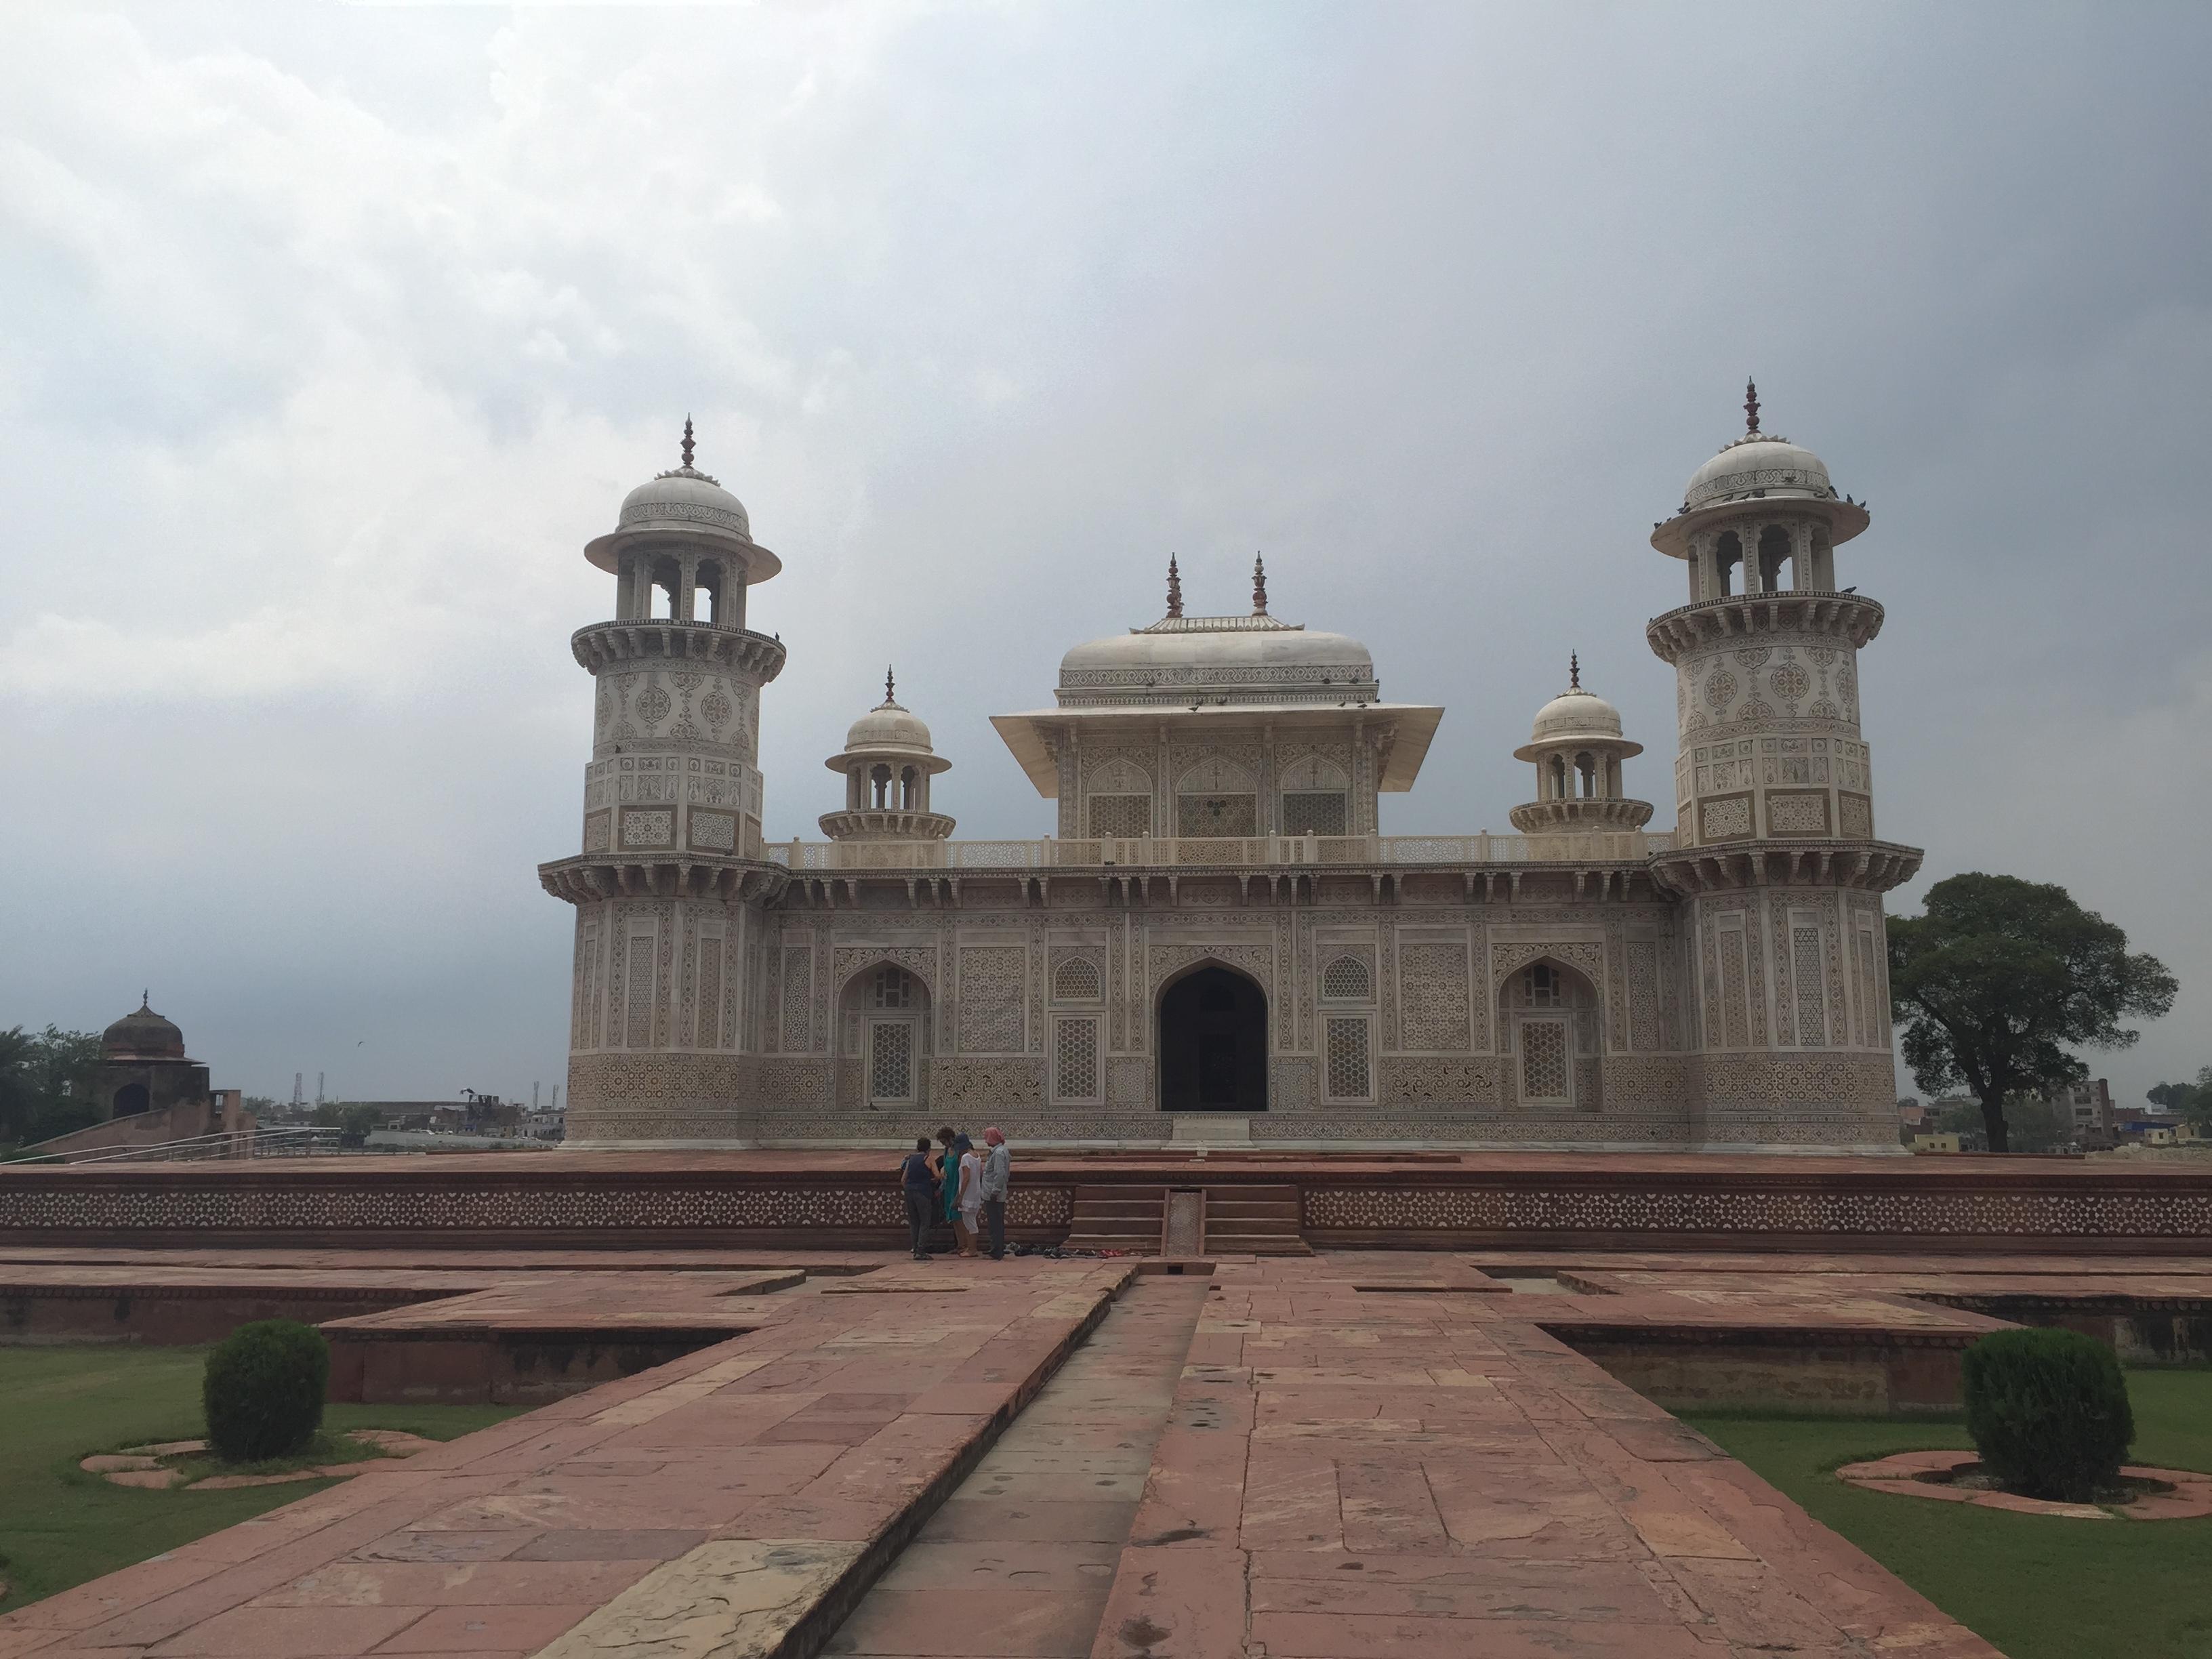 Itimad-ud-Daulah´s Tomb